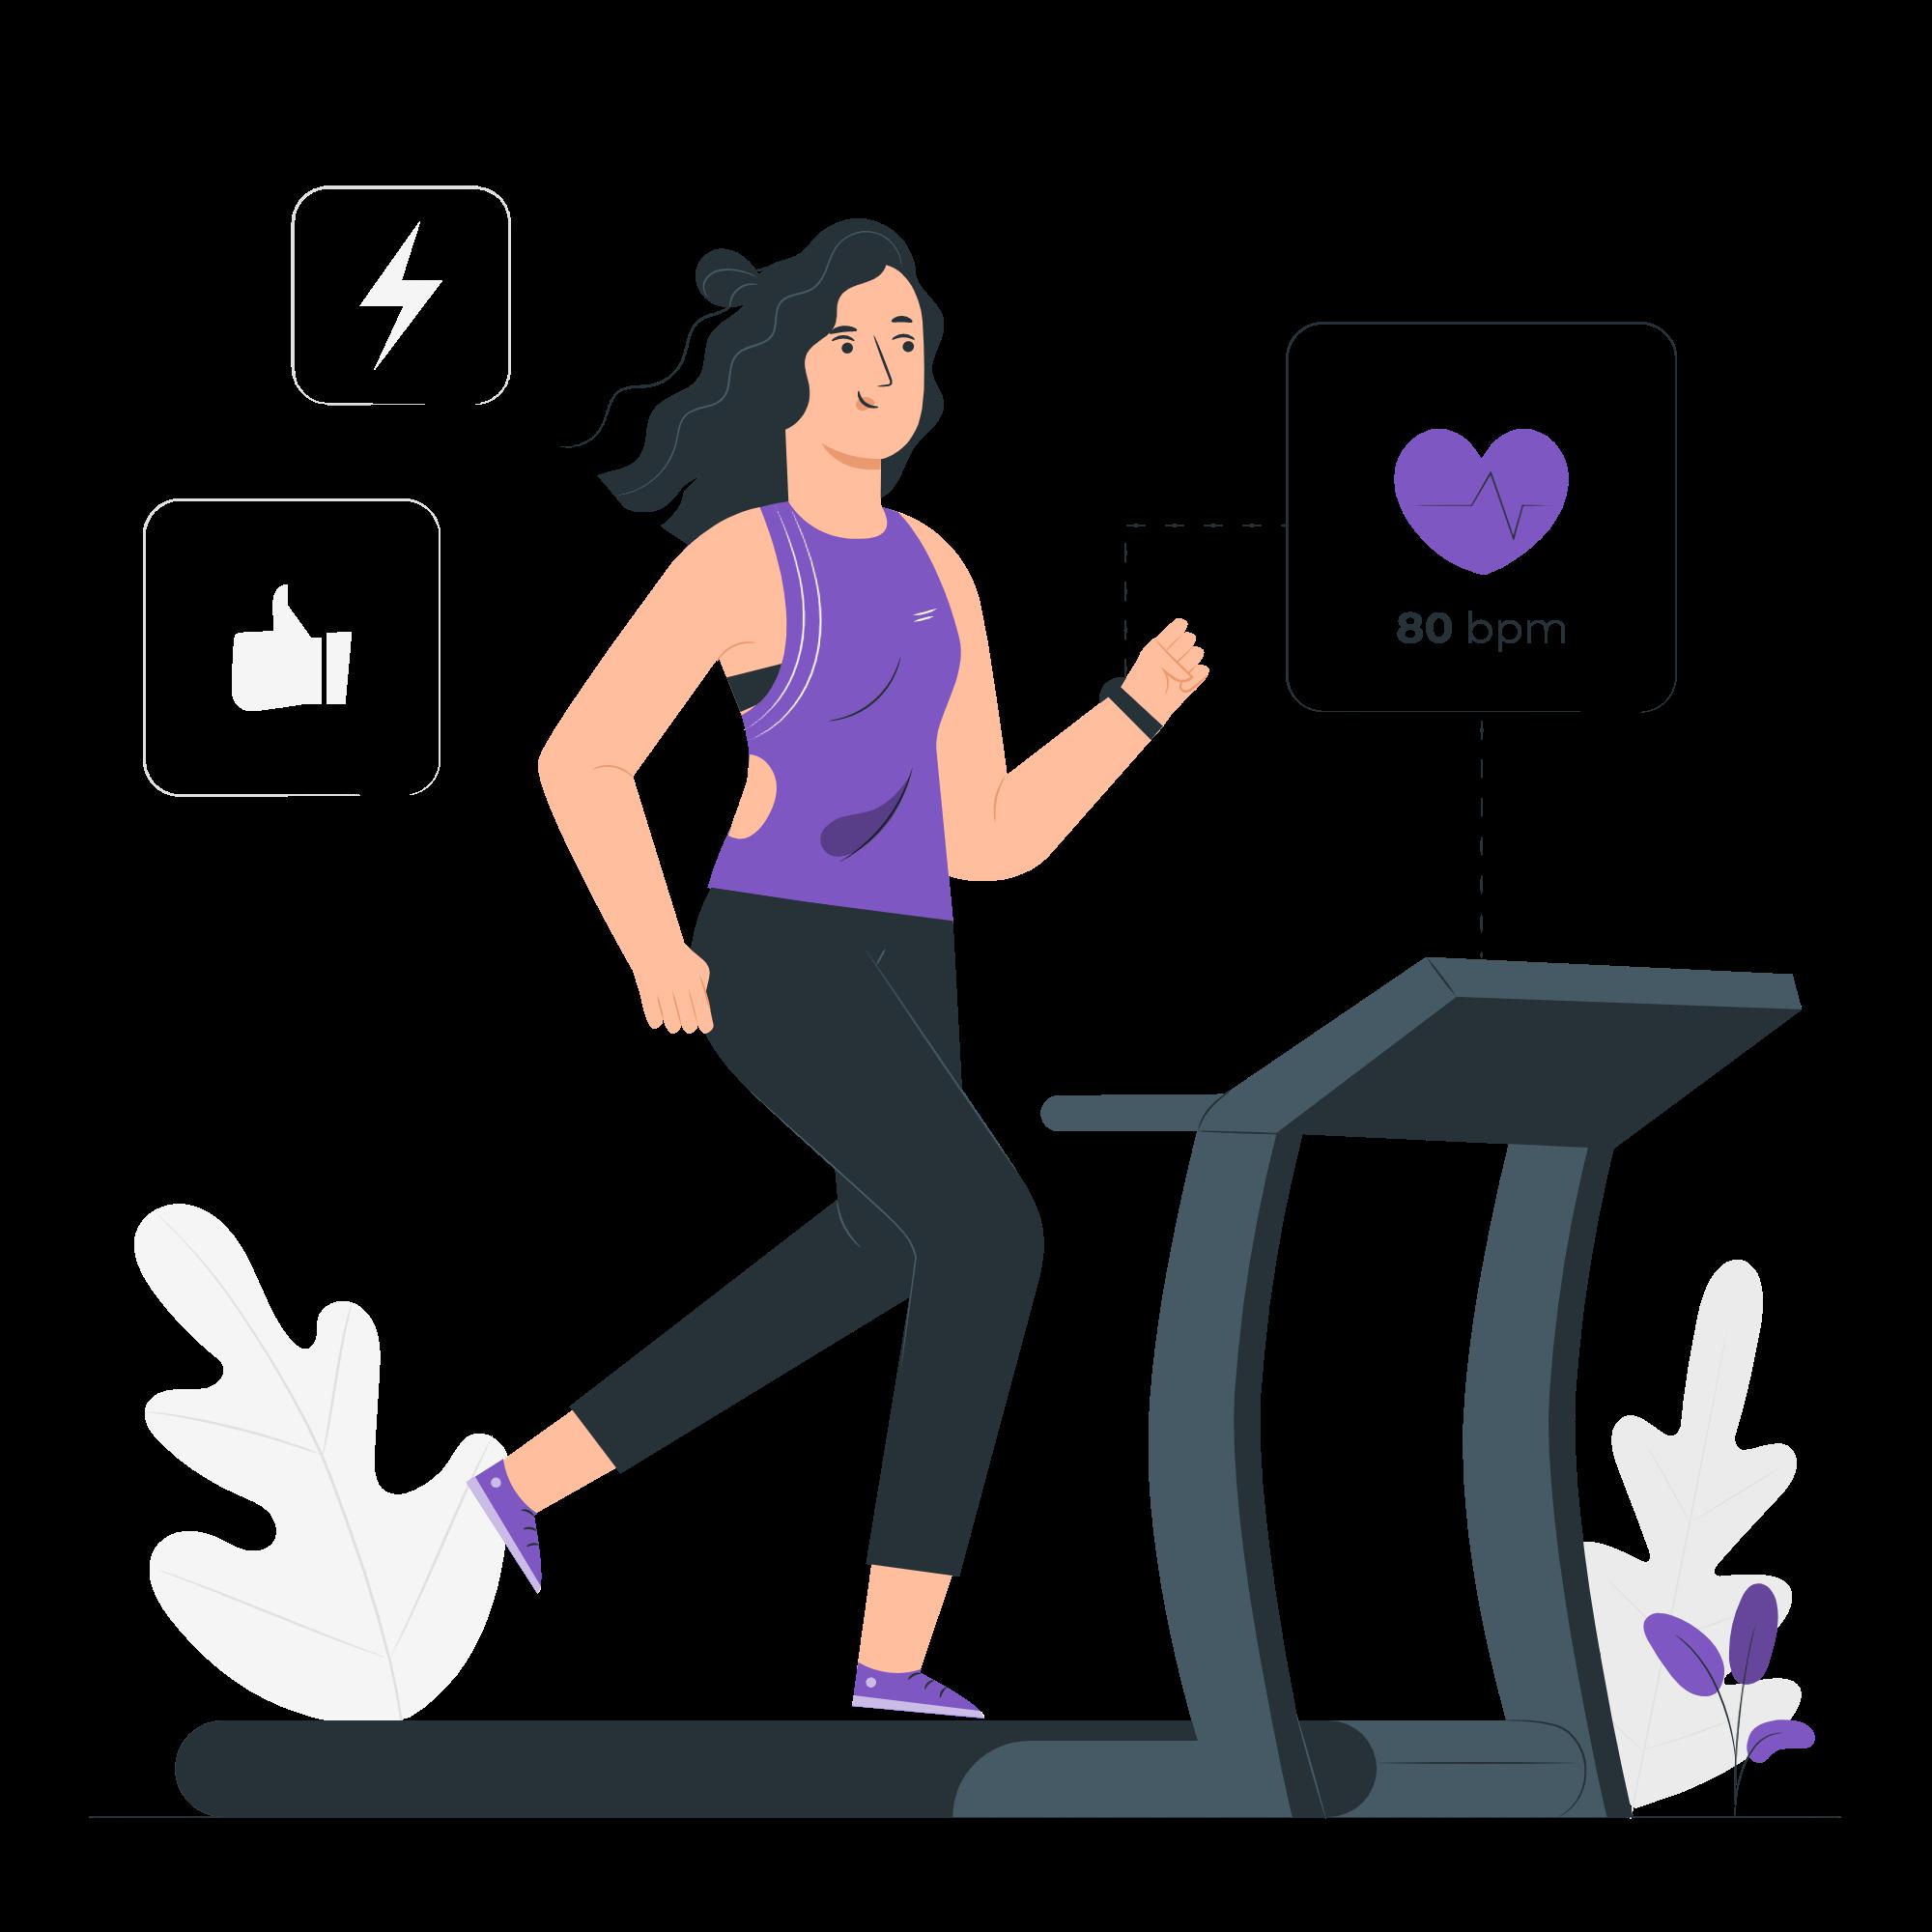 Rental business idea 1: fitness equipment